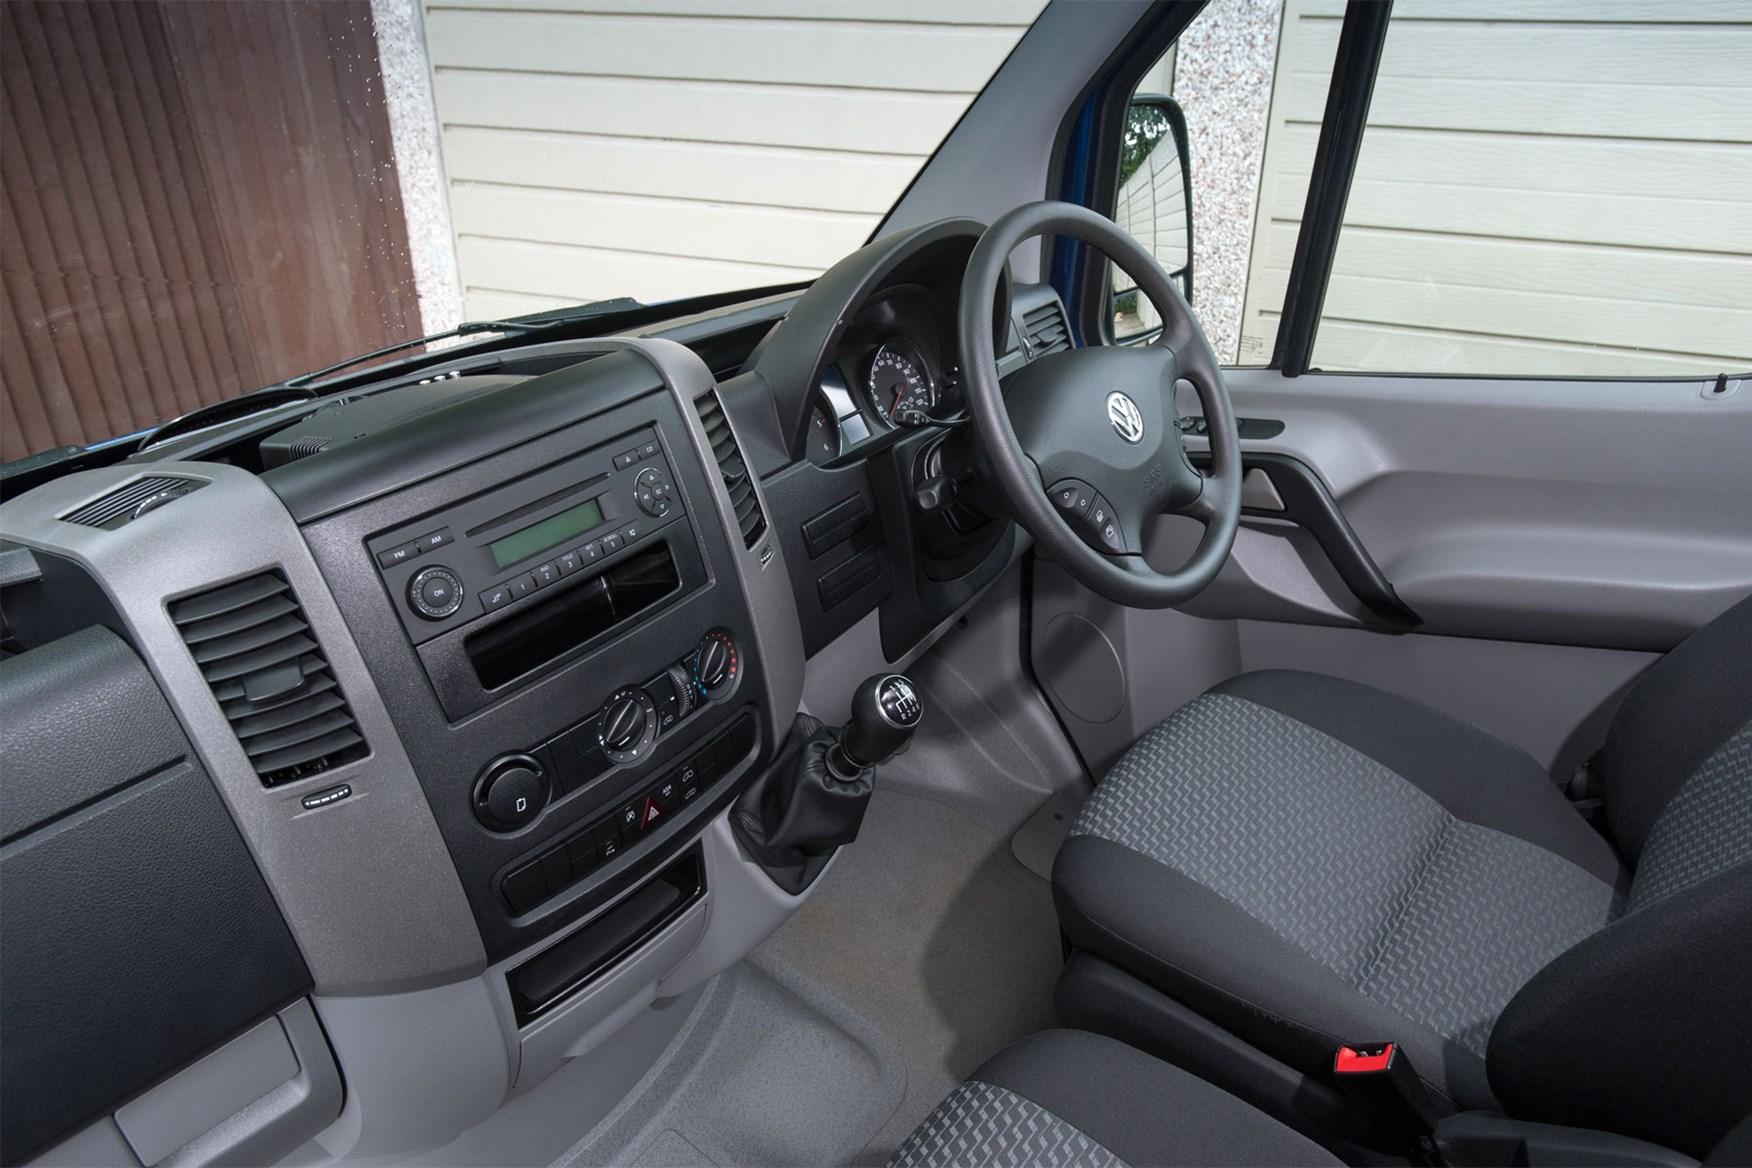 VW Crafter (2011-2016) cab interior